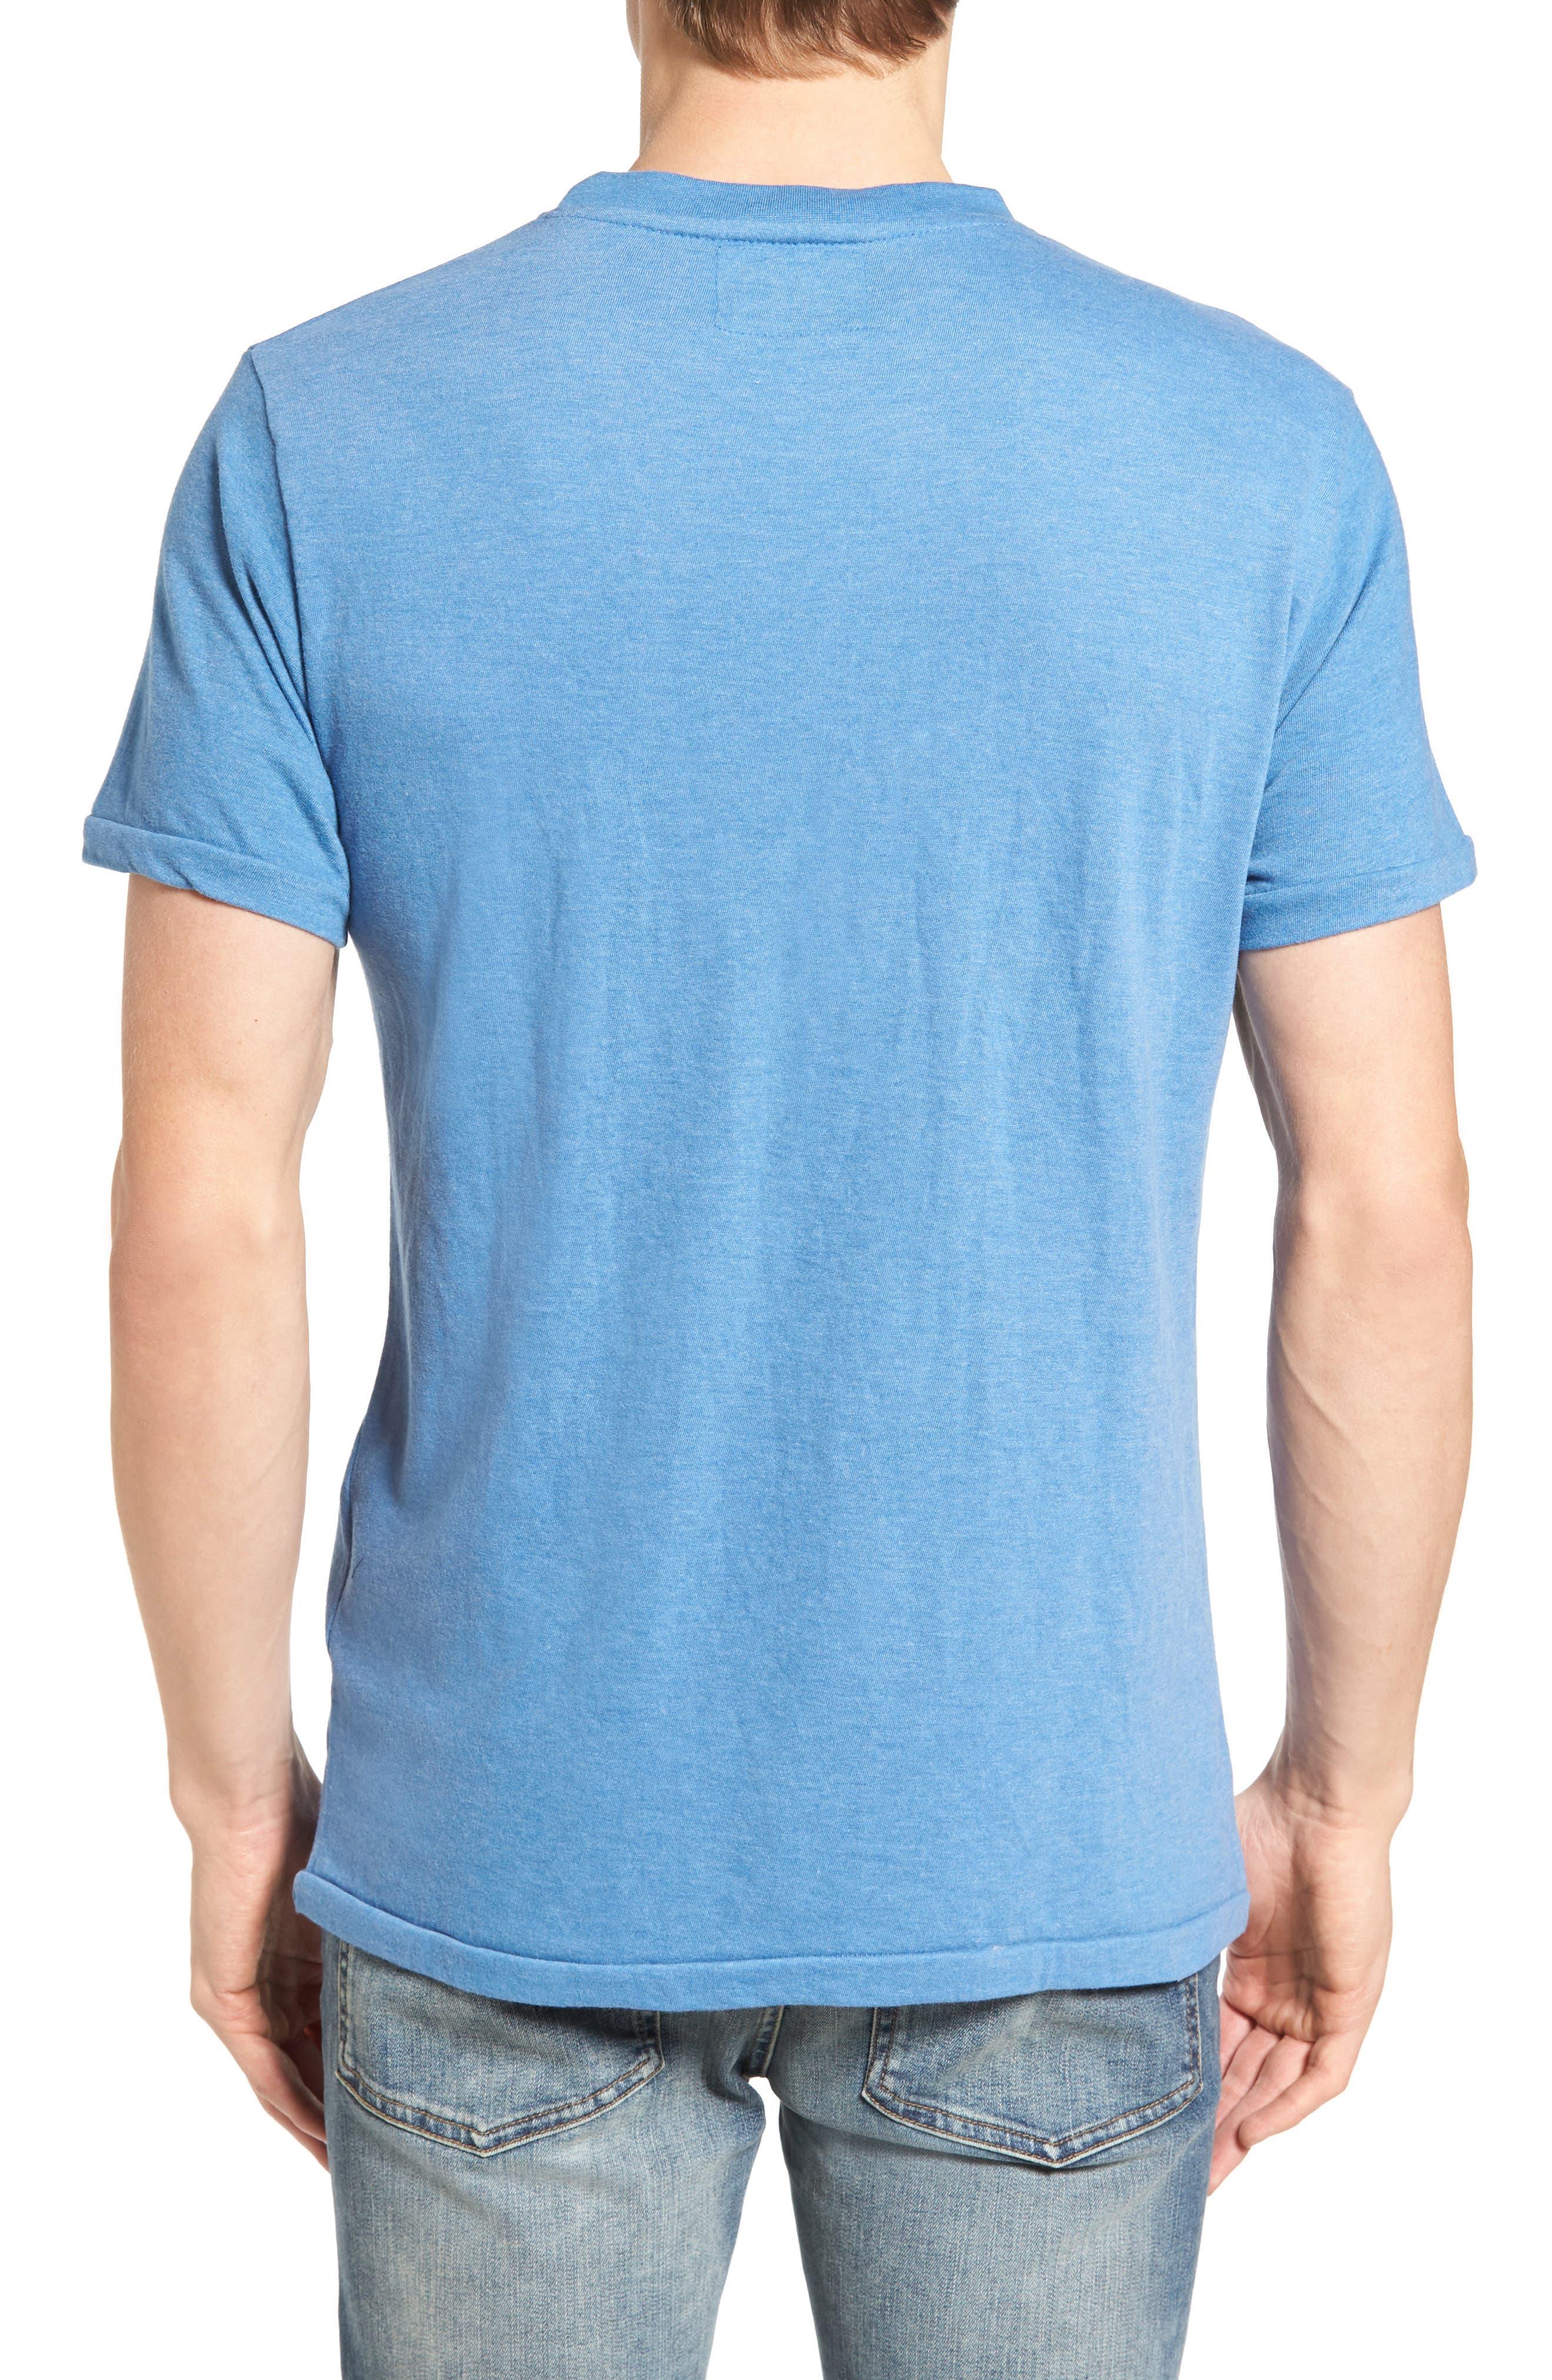 Hillwood Los Angeles Dodgers T-Shirt,                             Alternate thumbnail 2, color,                             464